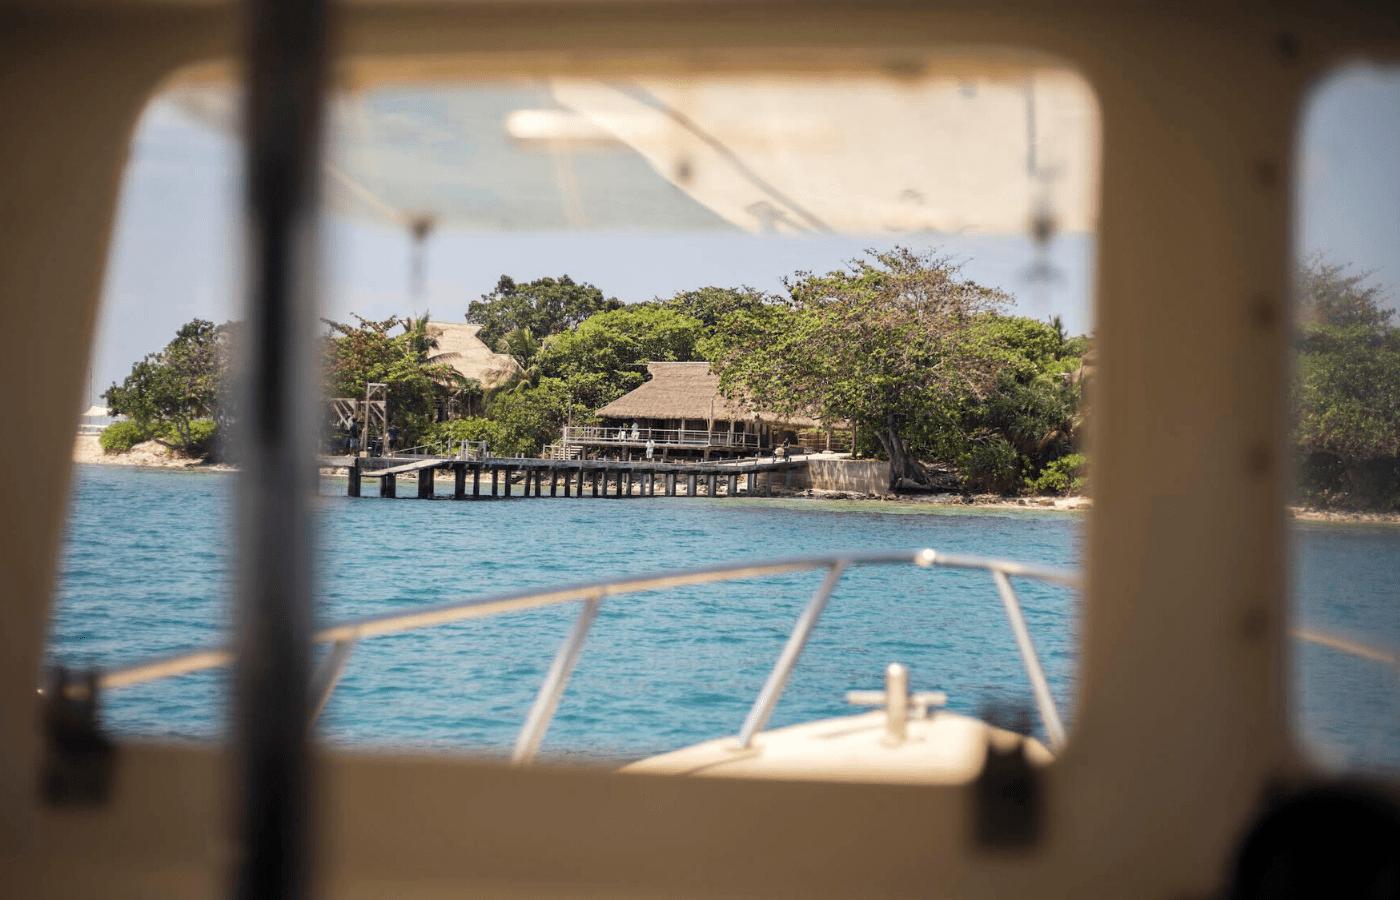 nikoi private island | private island resorts in Southeast Asia